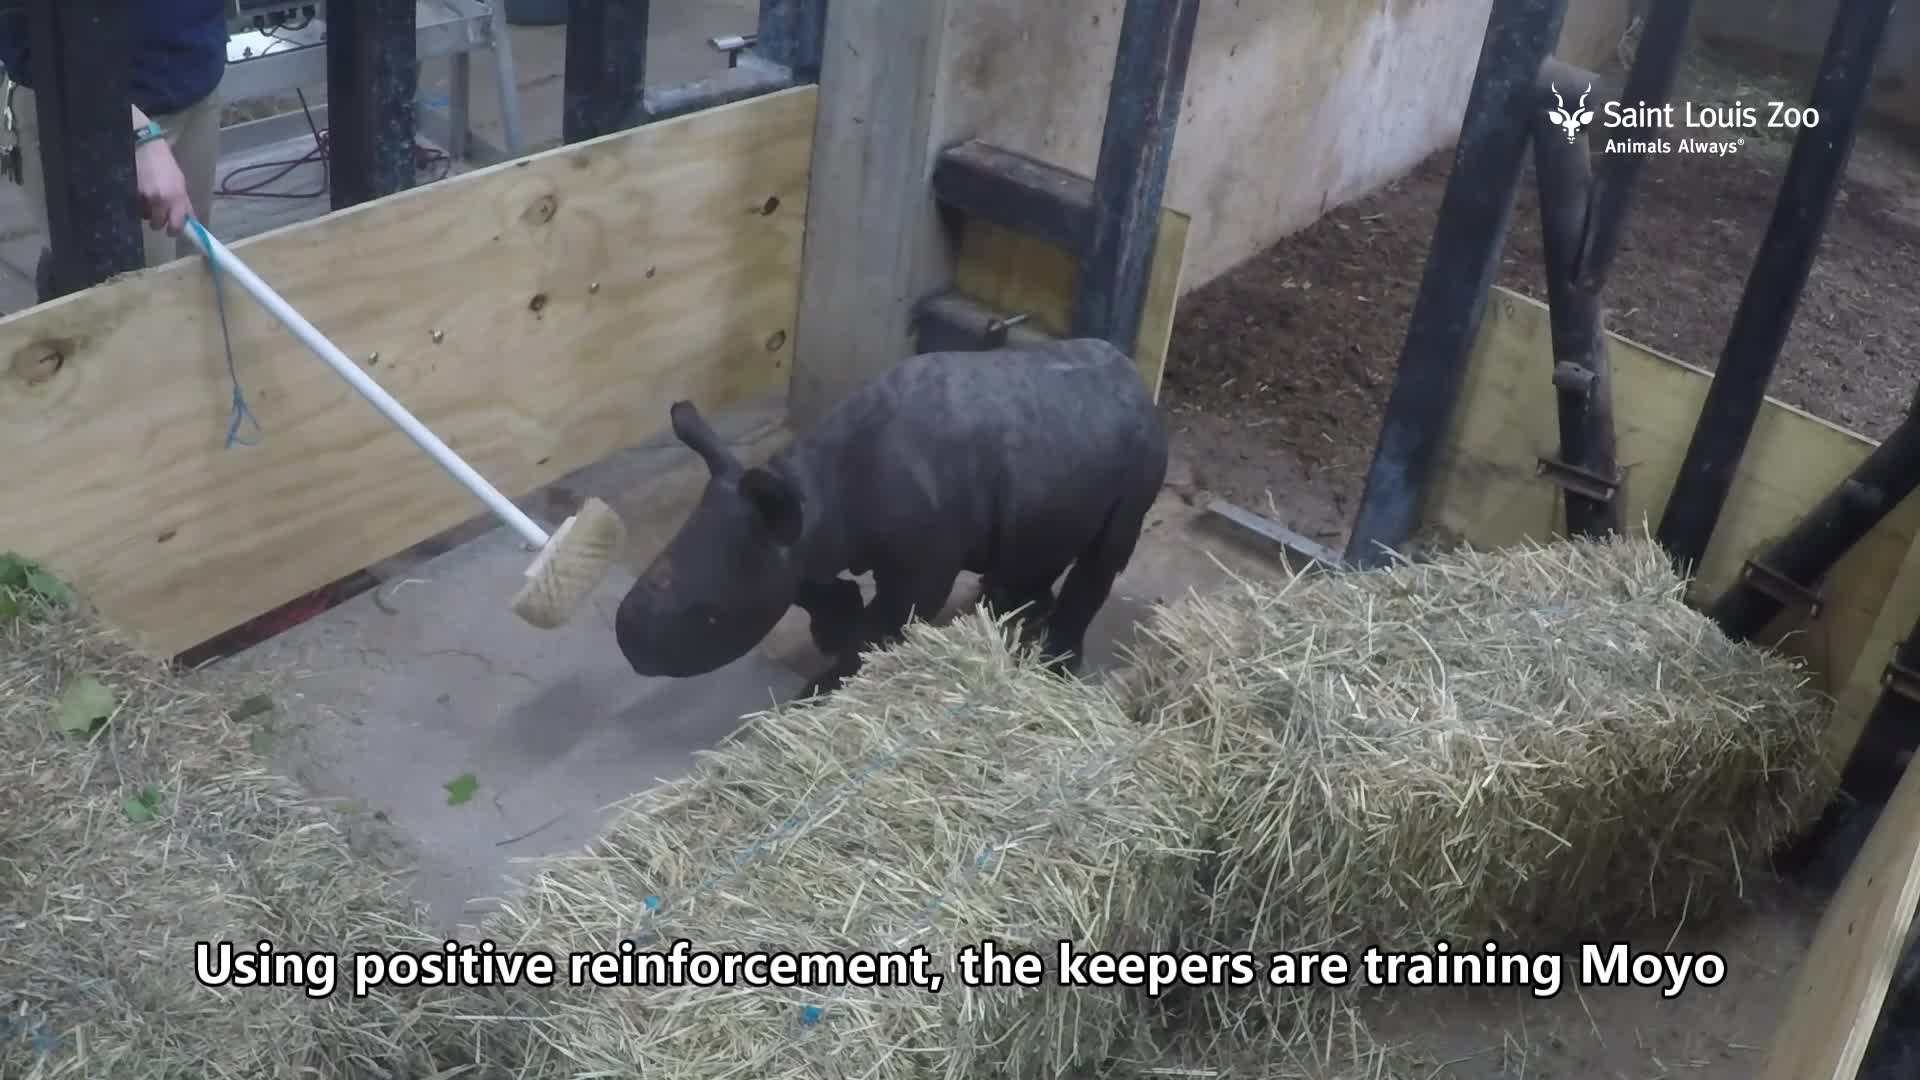 Black rhino calf Moyo gets weighed at Saint Louis Zoo GIFs